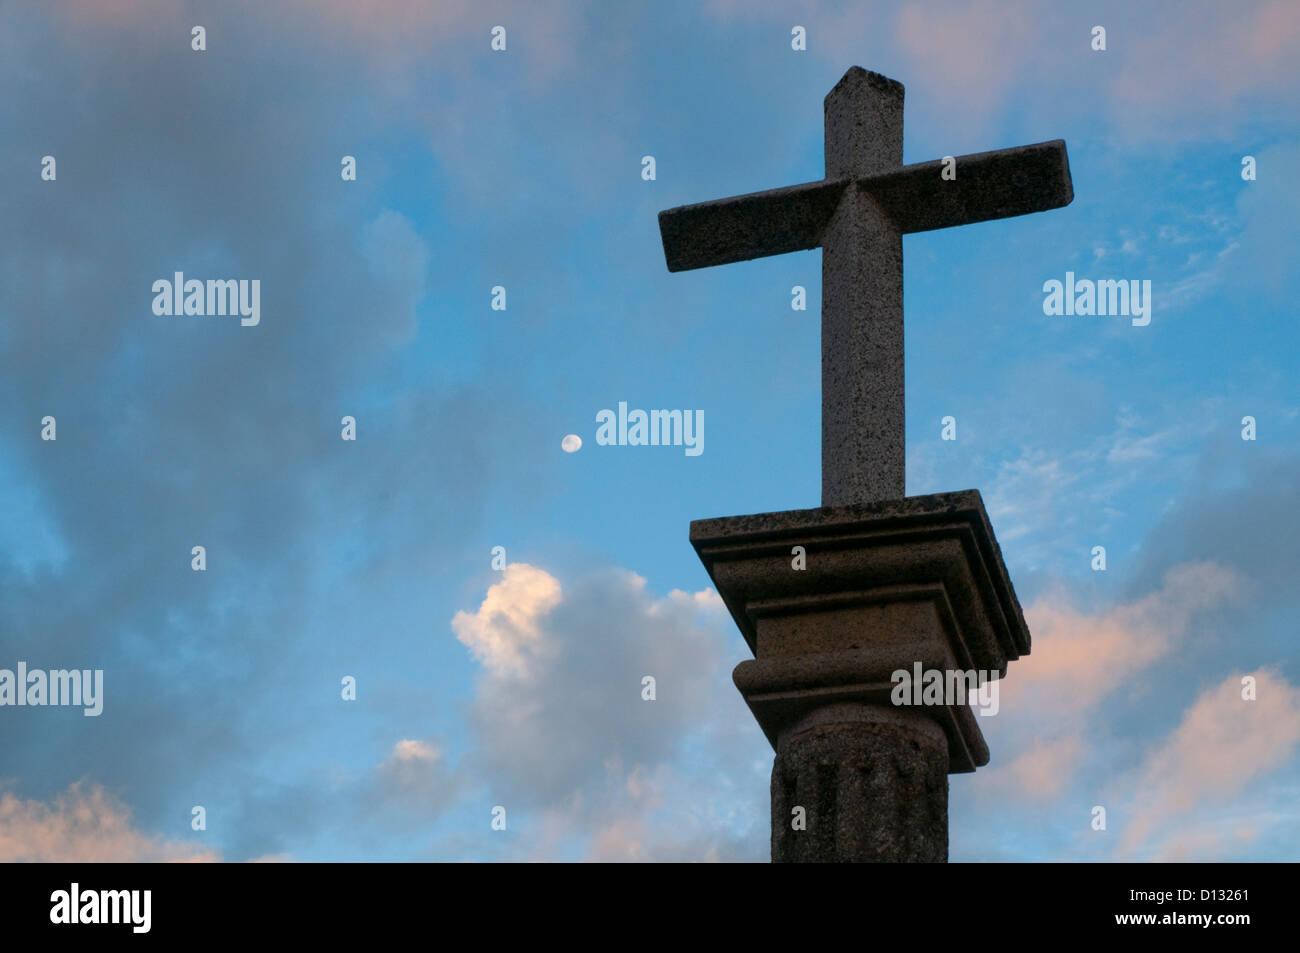 Stone cross against cloudy sky. Candelario, Salamanca province, Castilla Leon, Spain. - Stock Image